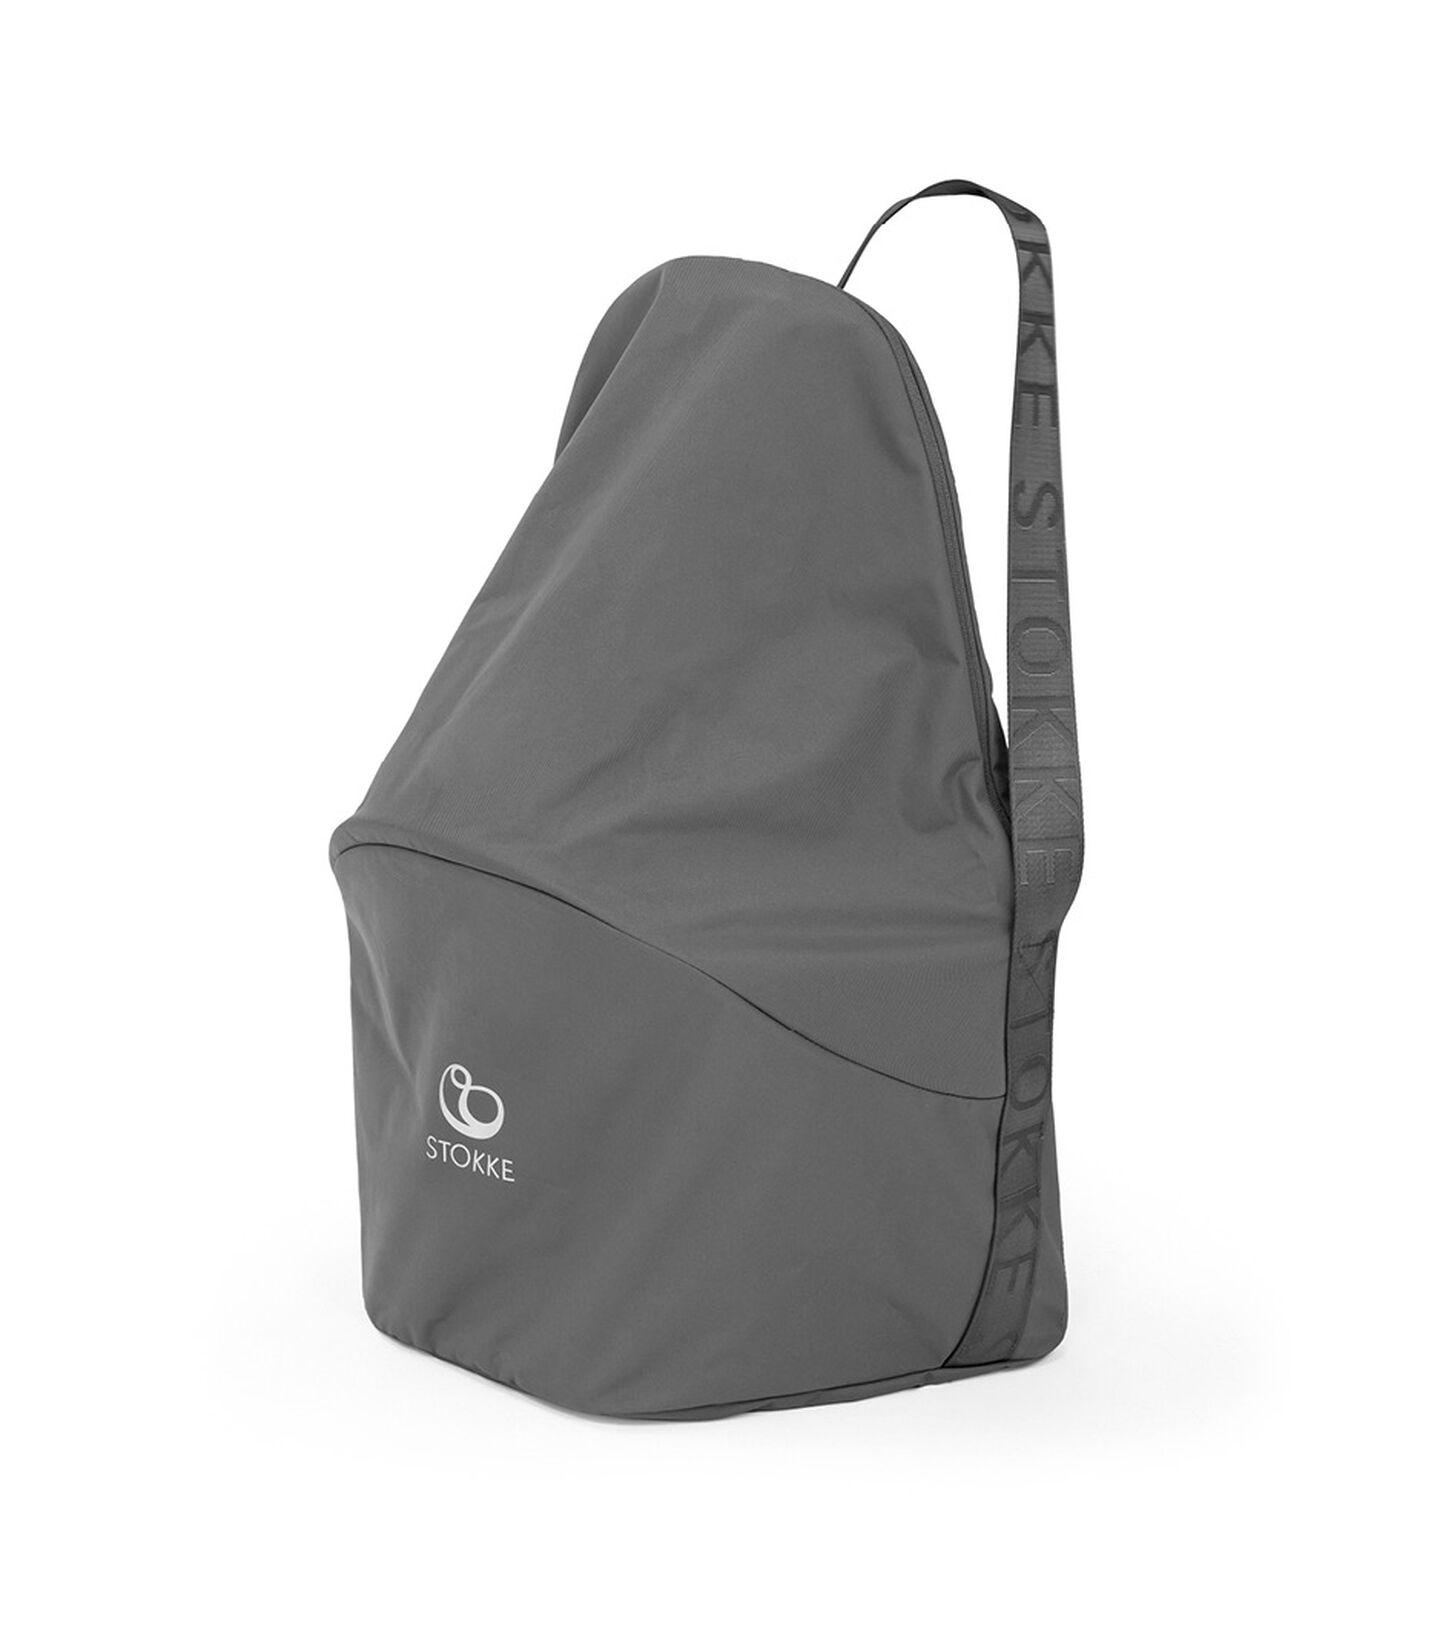 Stokke® Clikk™ Travel Bag Dark Grey, Gris foncé, mainview view 1